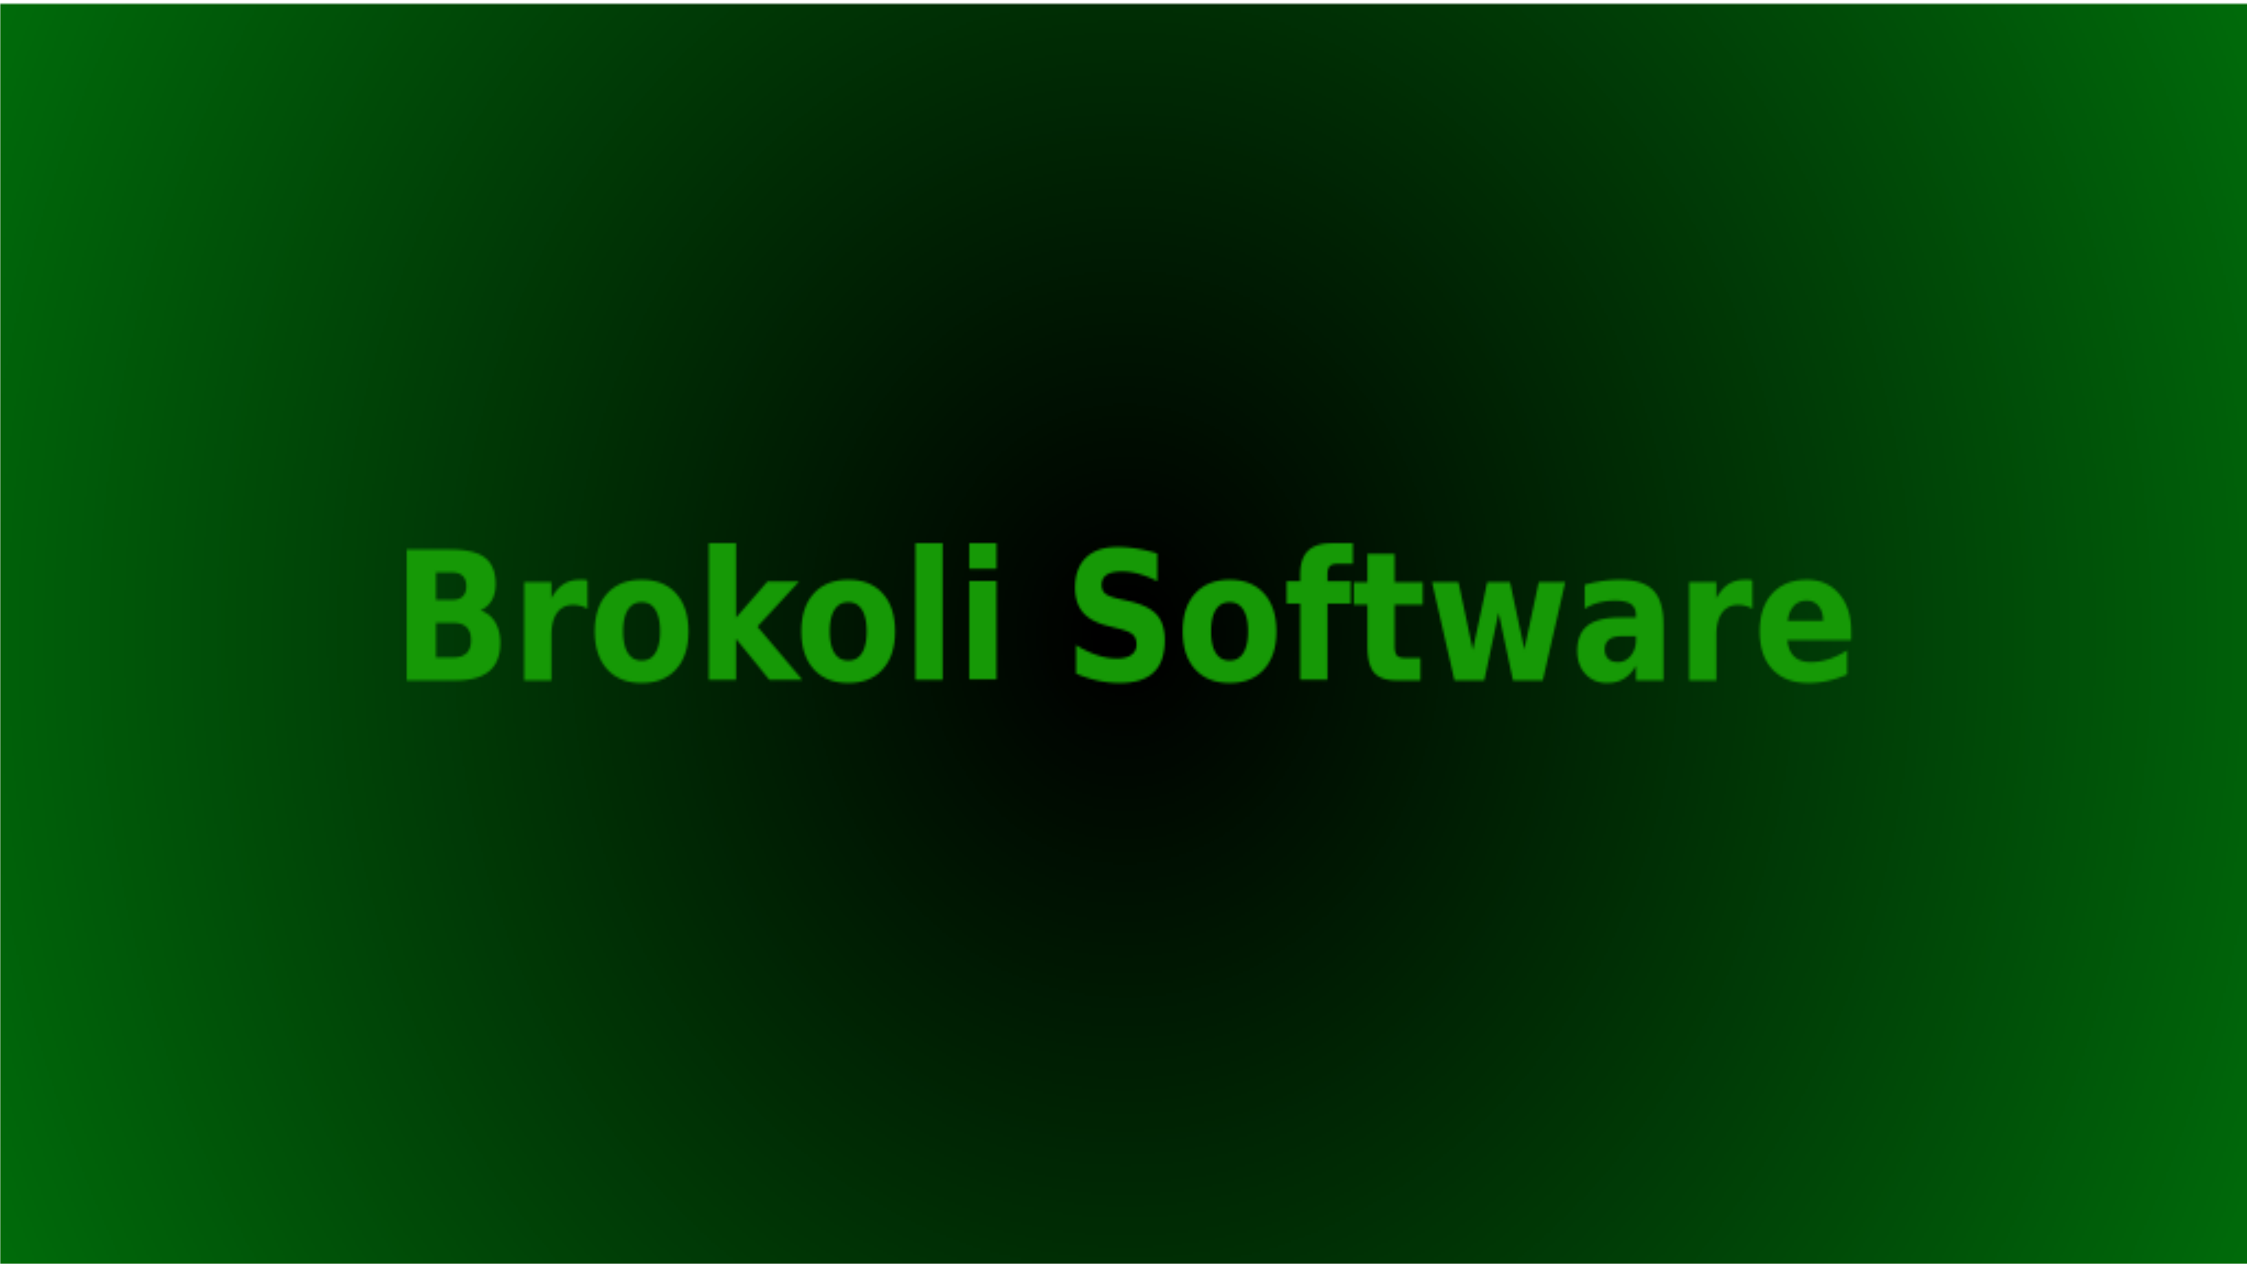 Brokoli Software